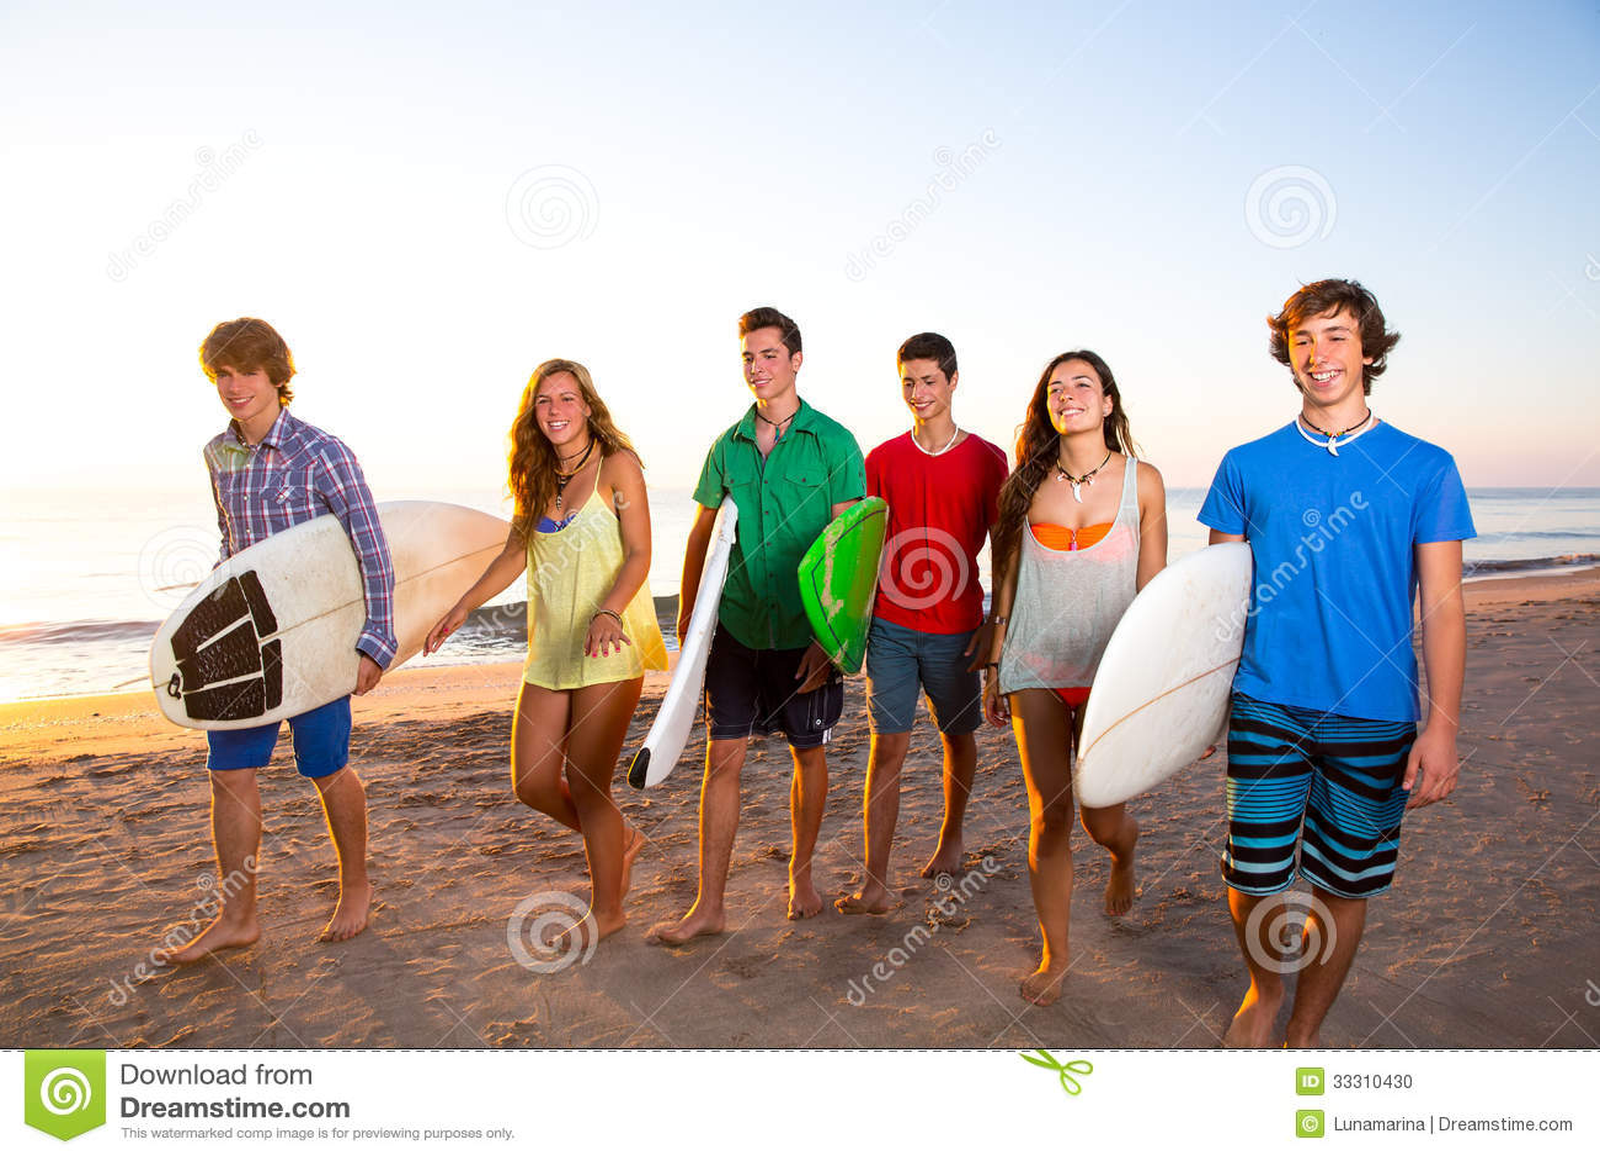 Meninas adolescentes na praia - ptdreamstimecom